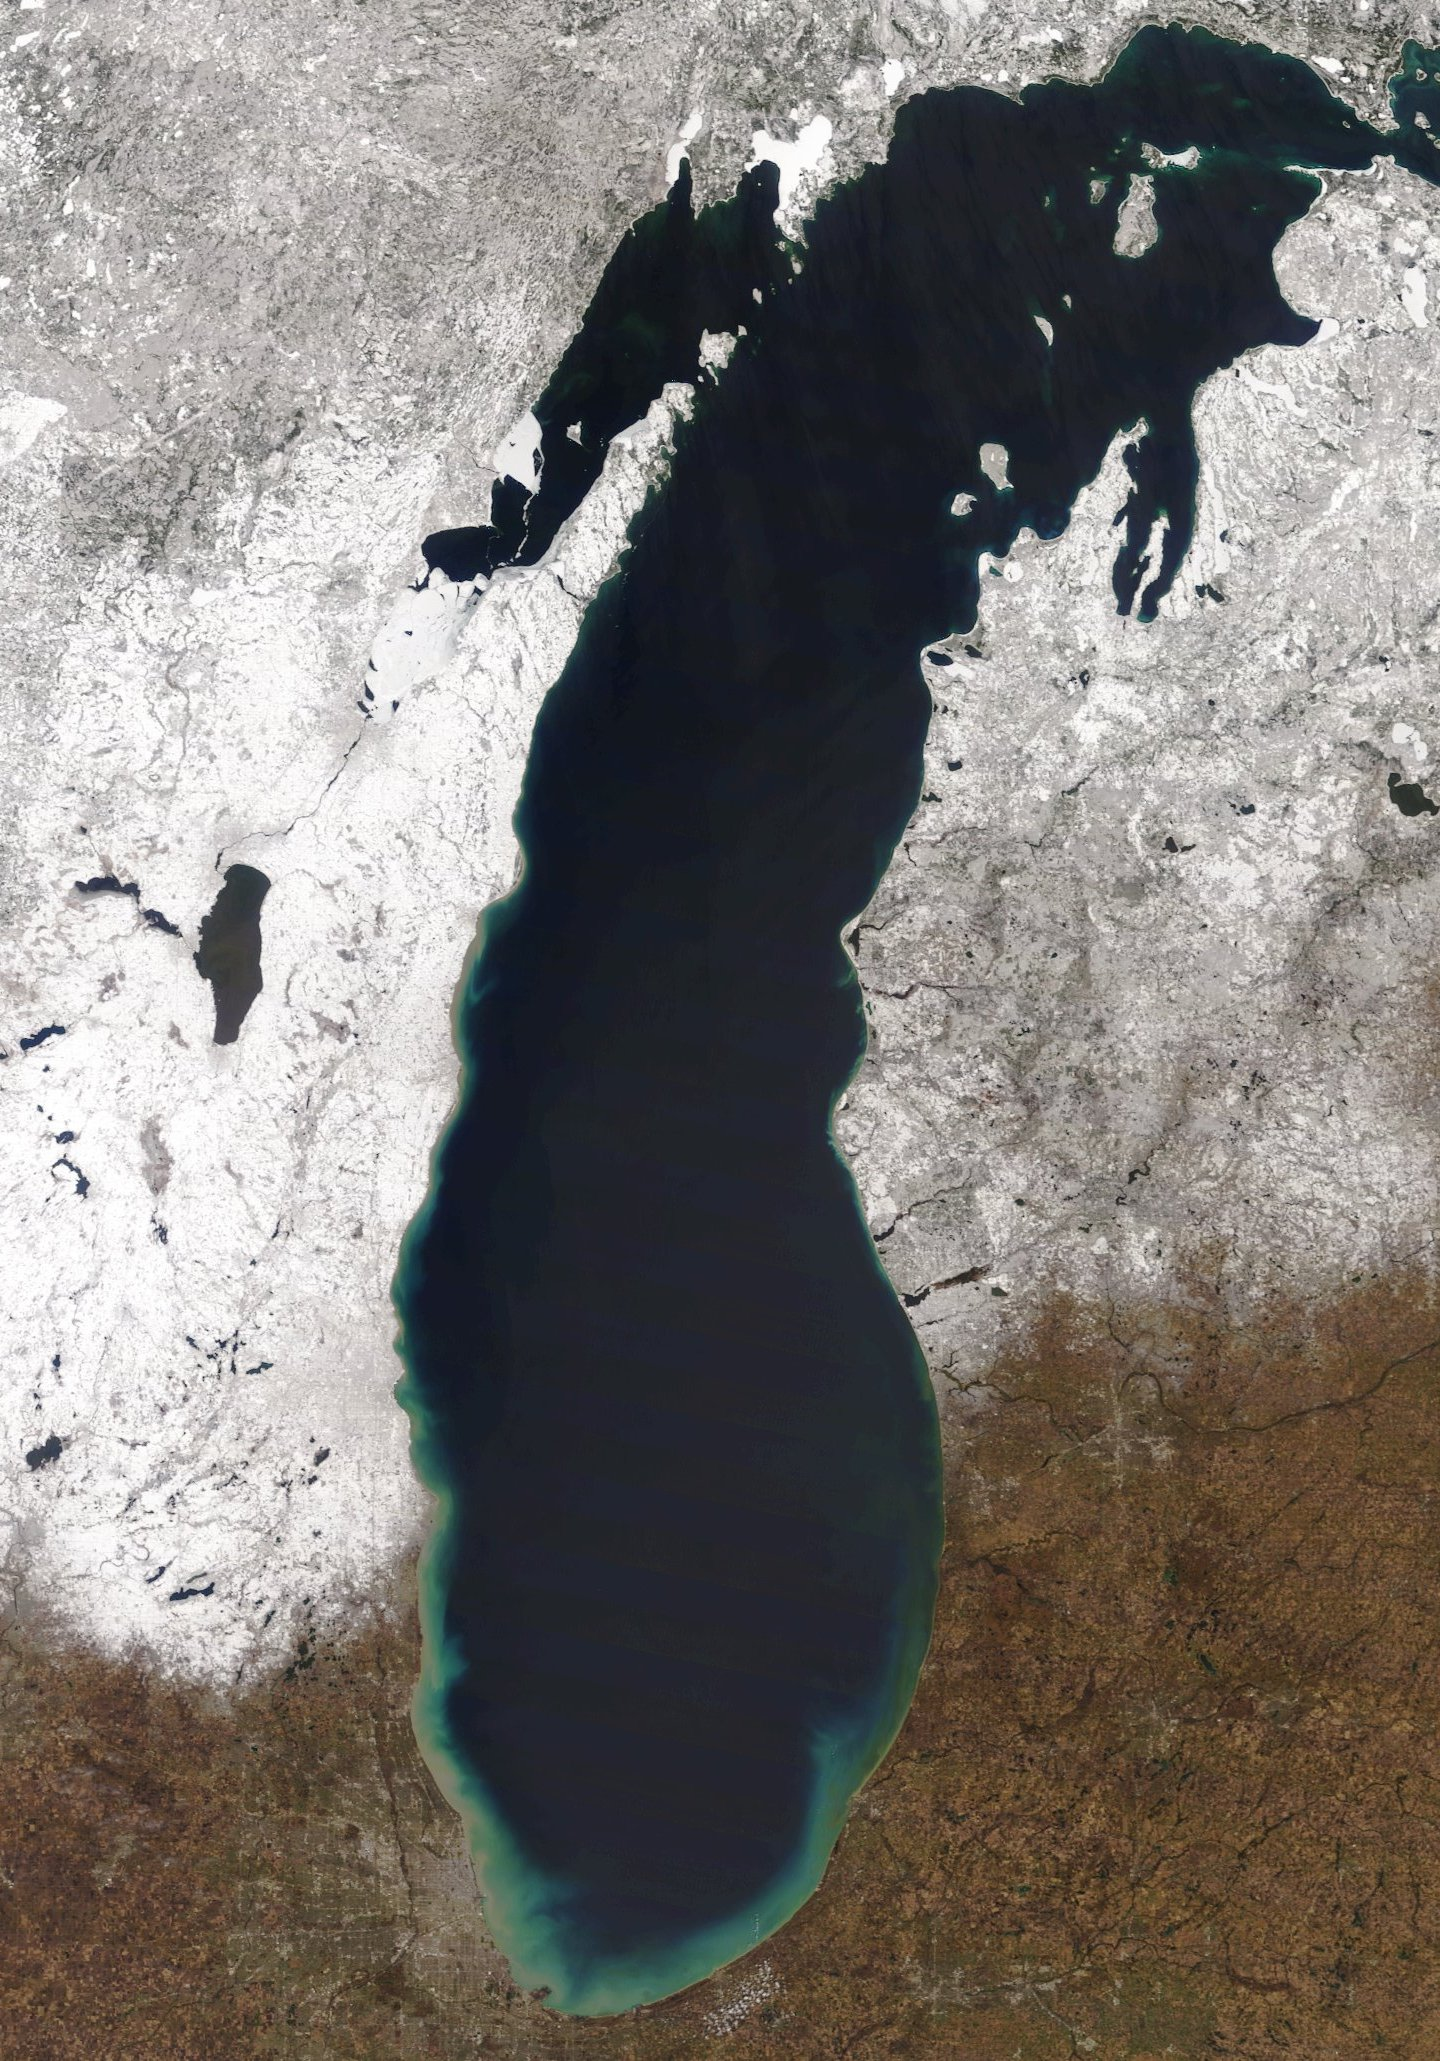 modis lake michigan clear 4 19 18_1524195497511.jpg.jpg